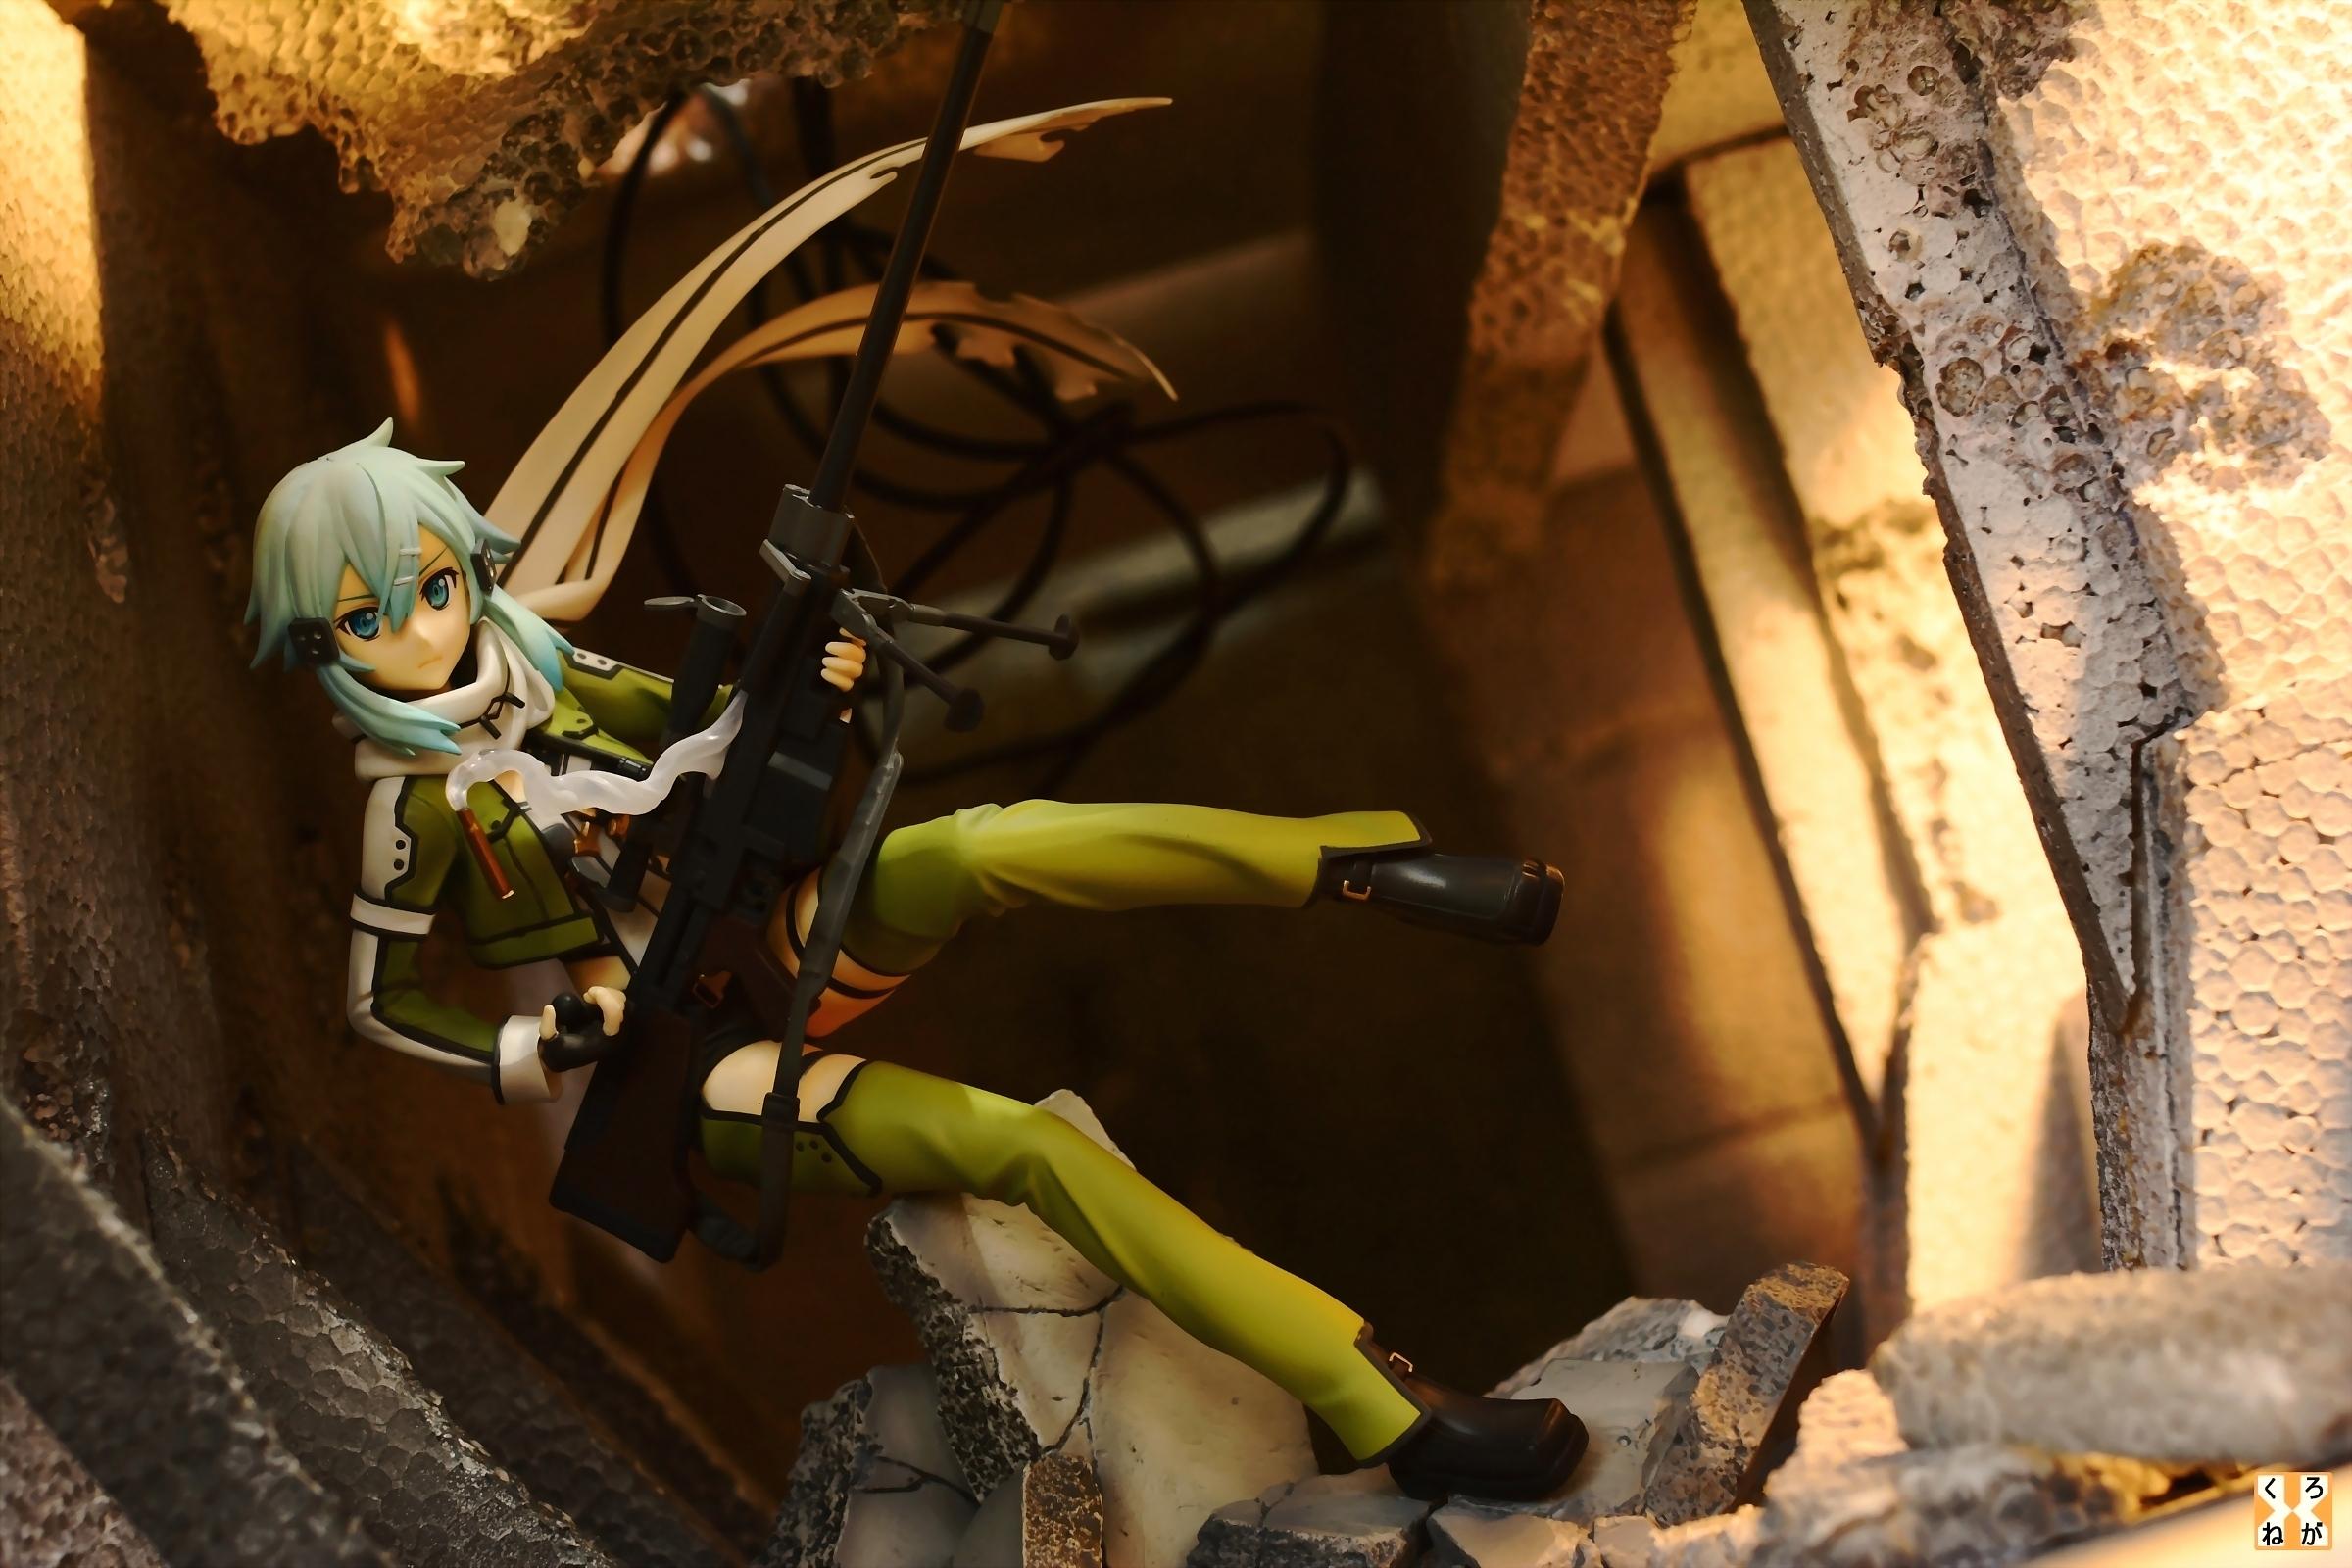 kotobukiya ascii_media_works kawahara_reki sinon hoya_mitsuru sword_art_online_ii